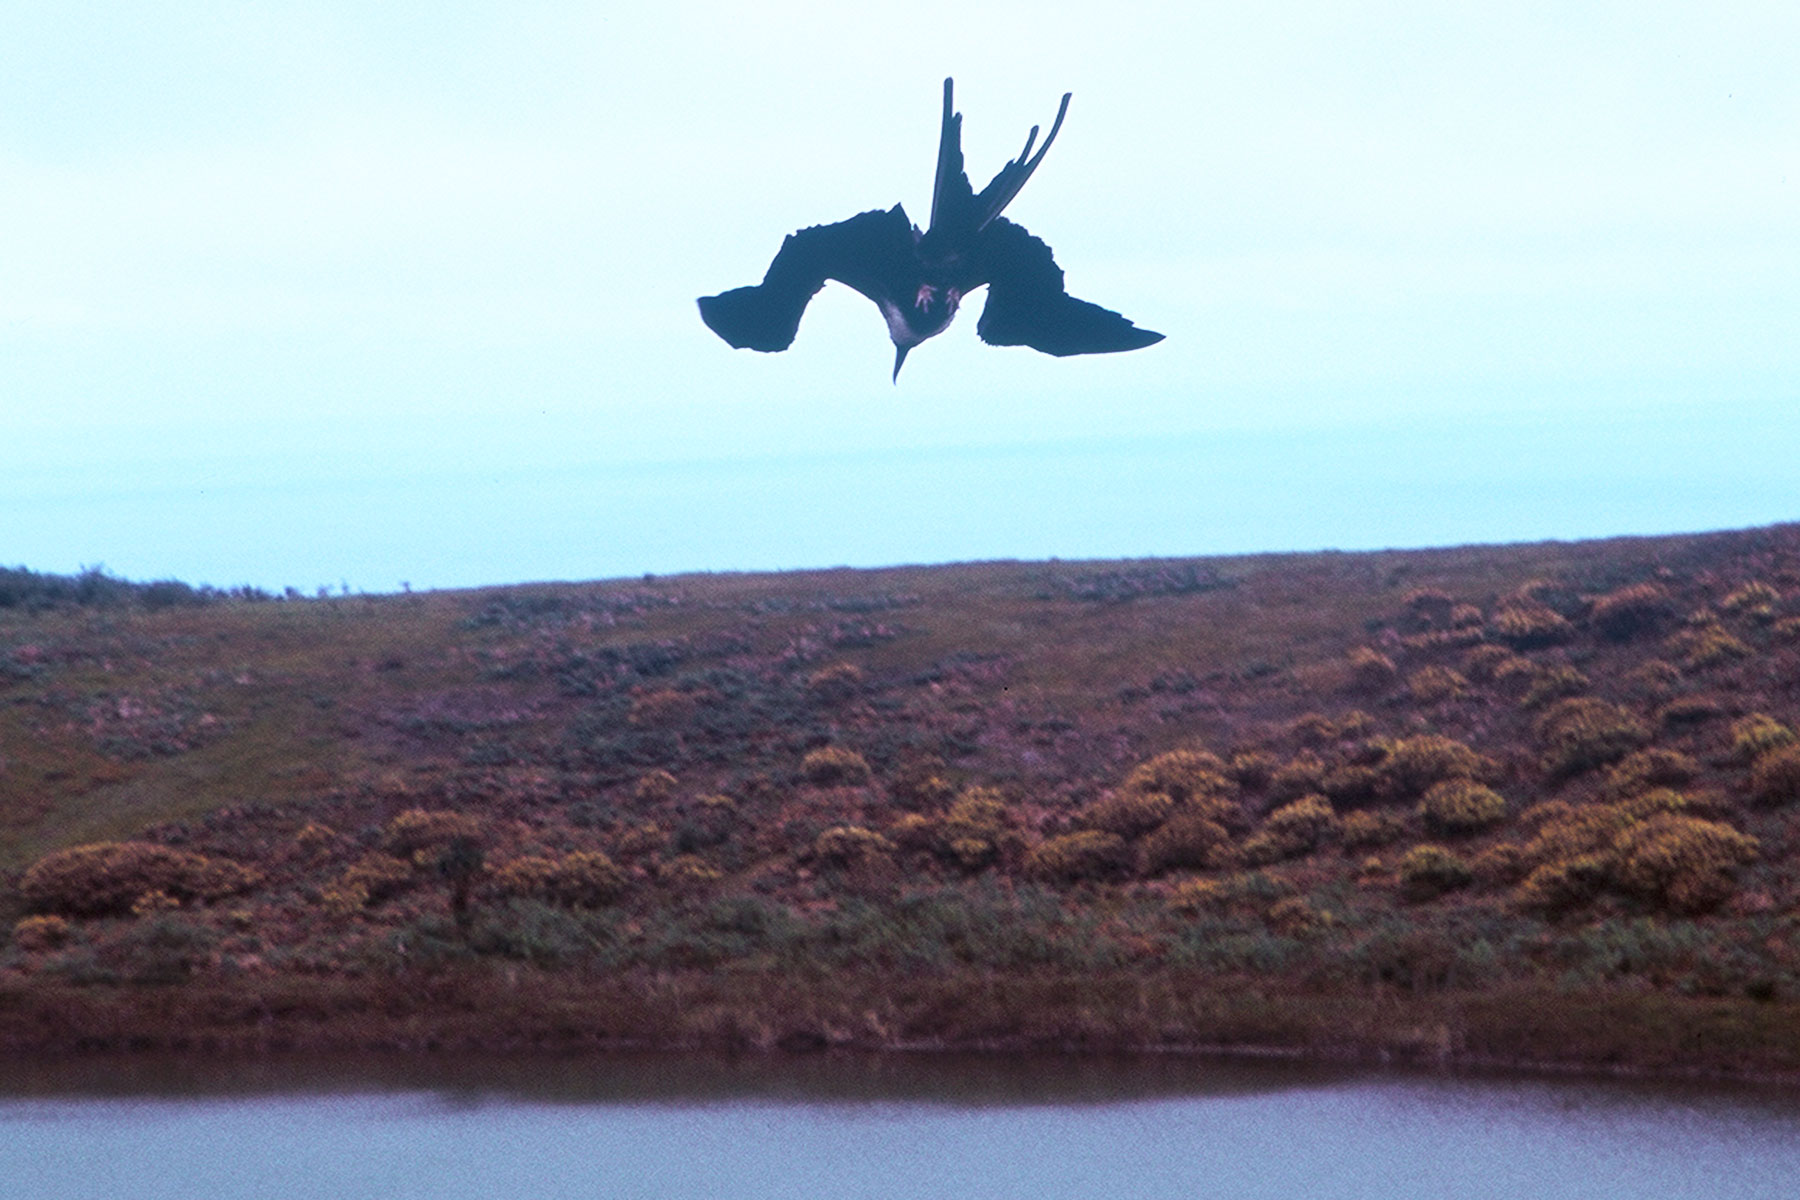 Frigatebird at Crater Lagoon (El Junco) | Steven Andrew Martin | Galapagos Study Abroad Journal